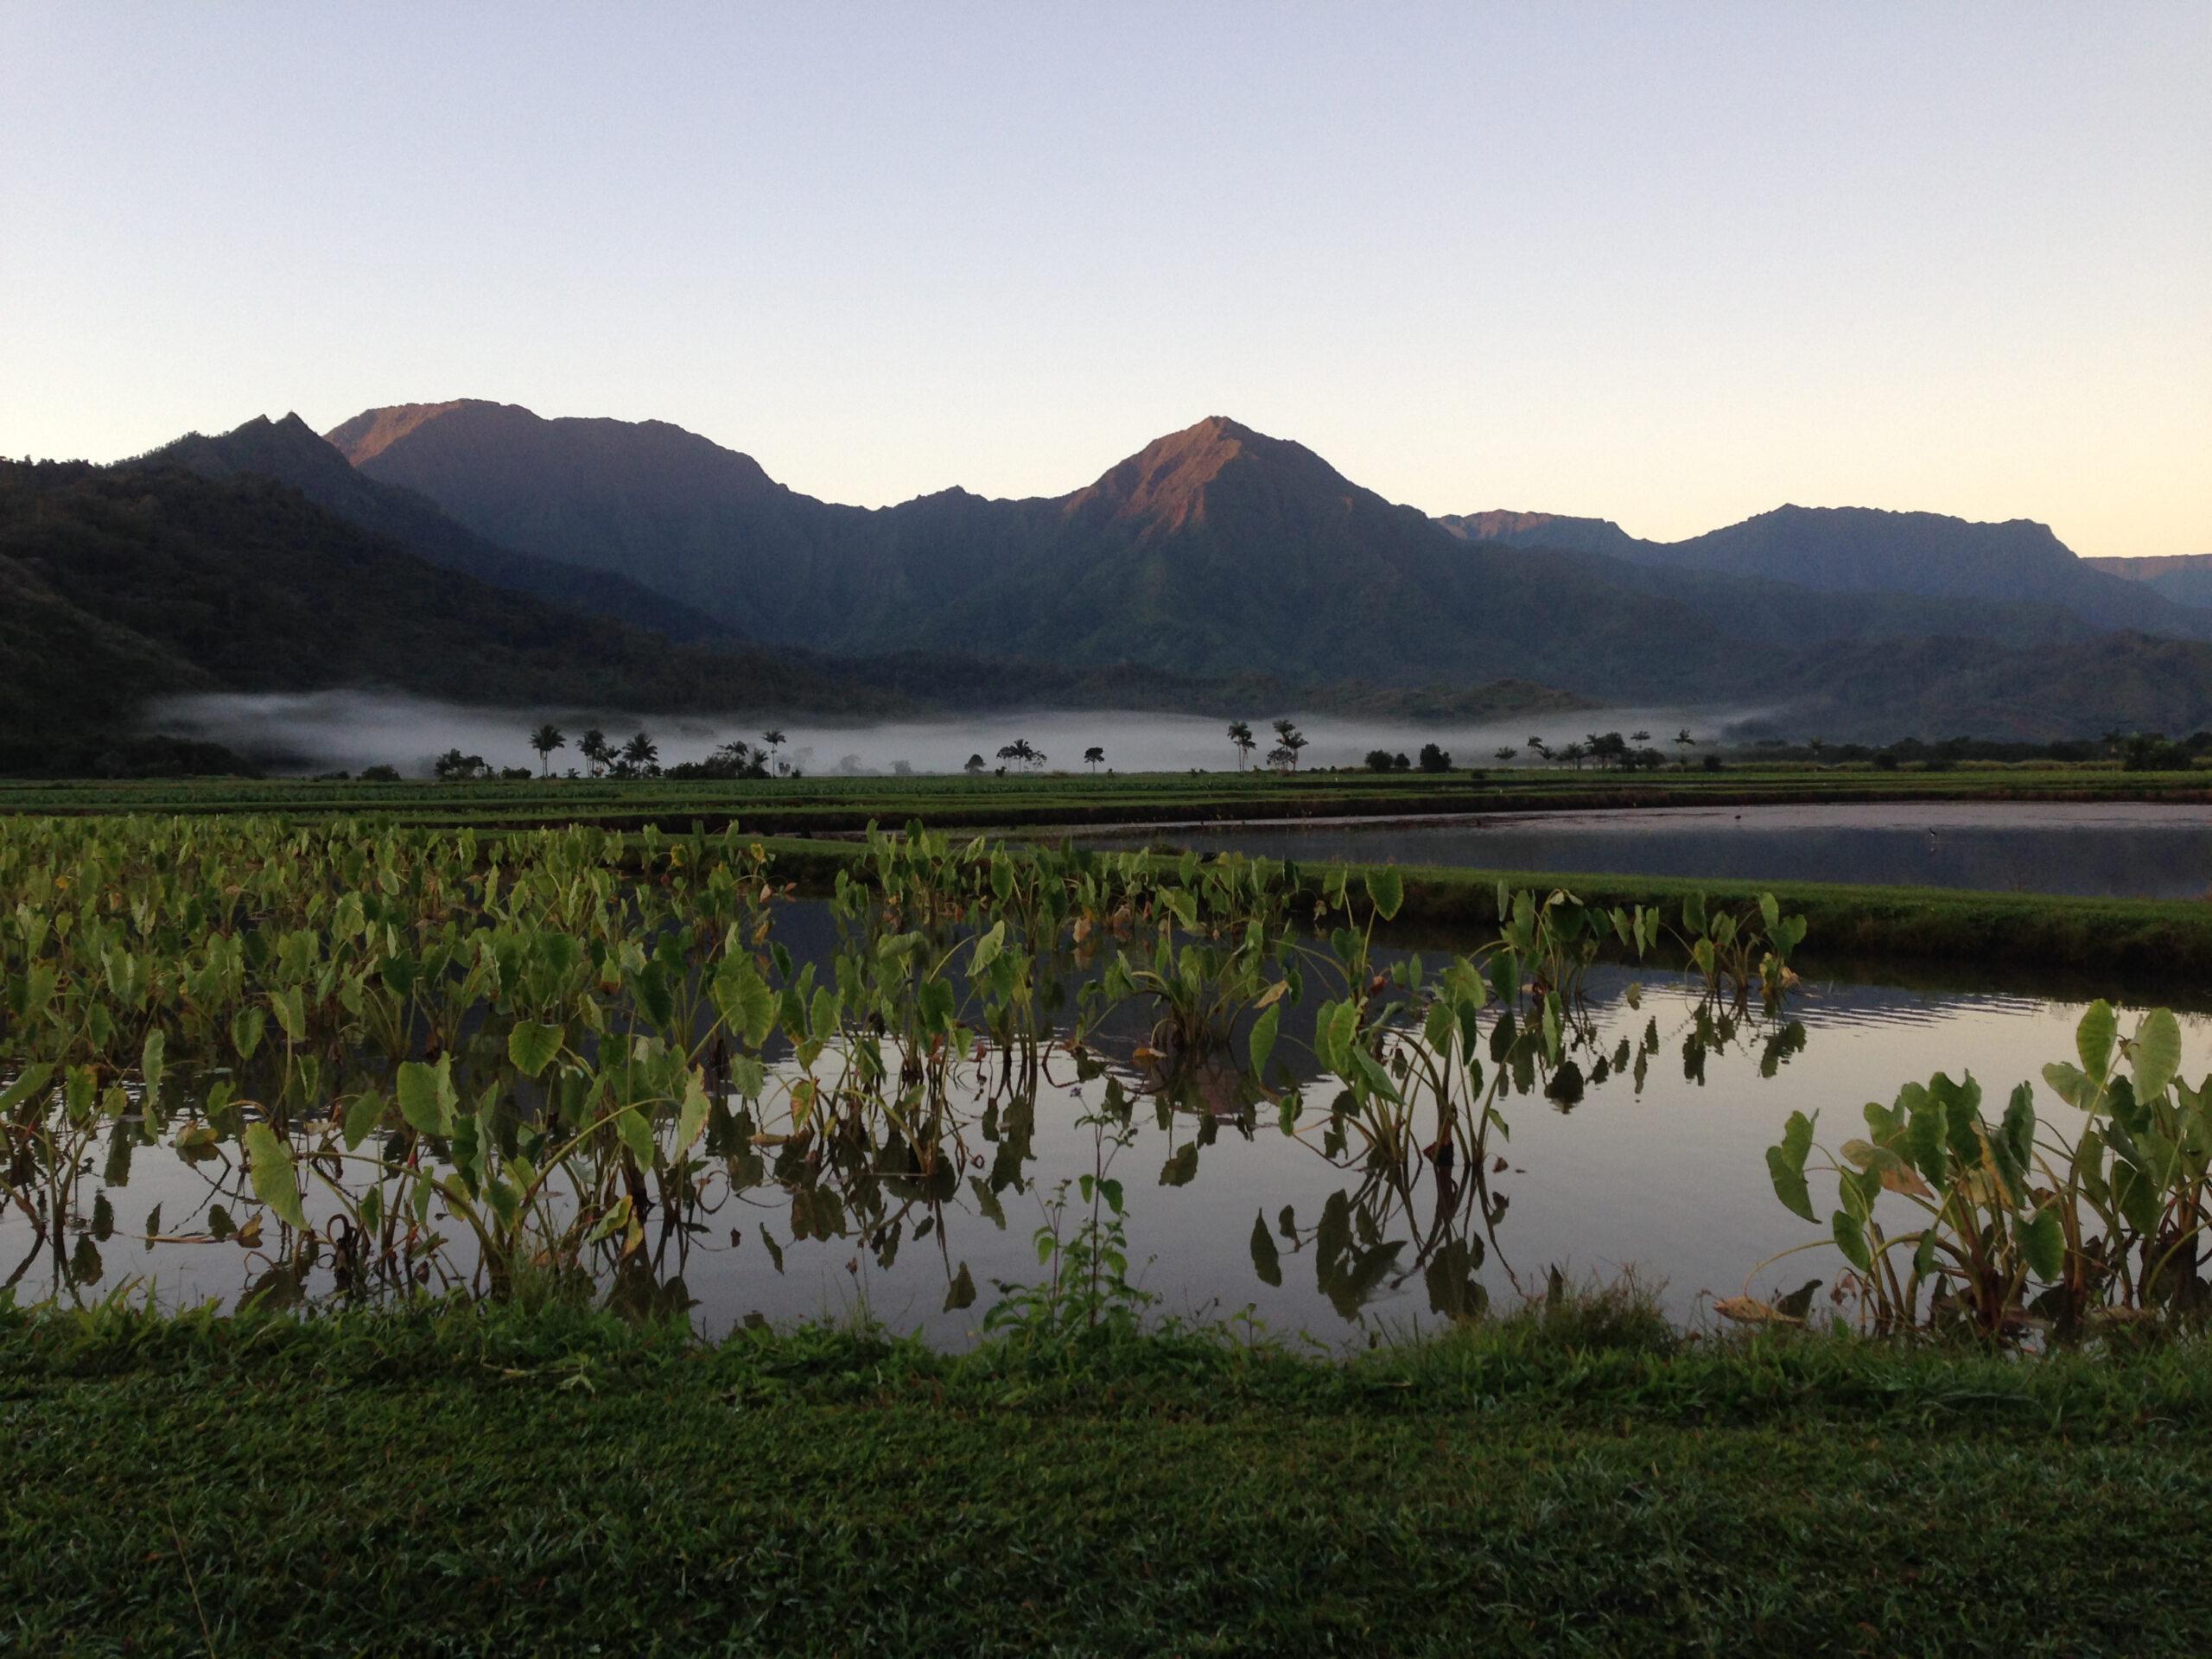 View of the taro fields in the Hanalei valley of Kauai